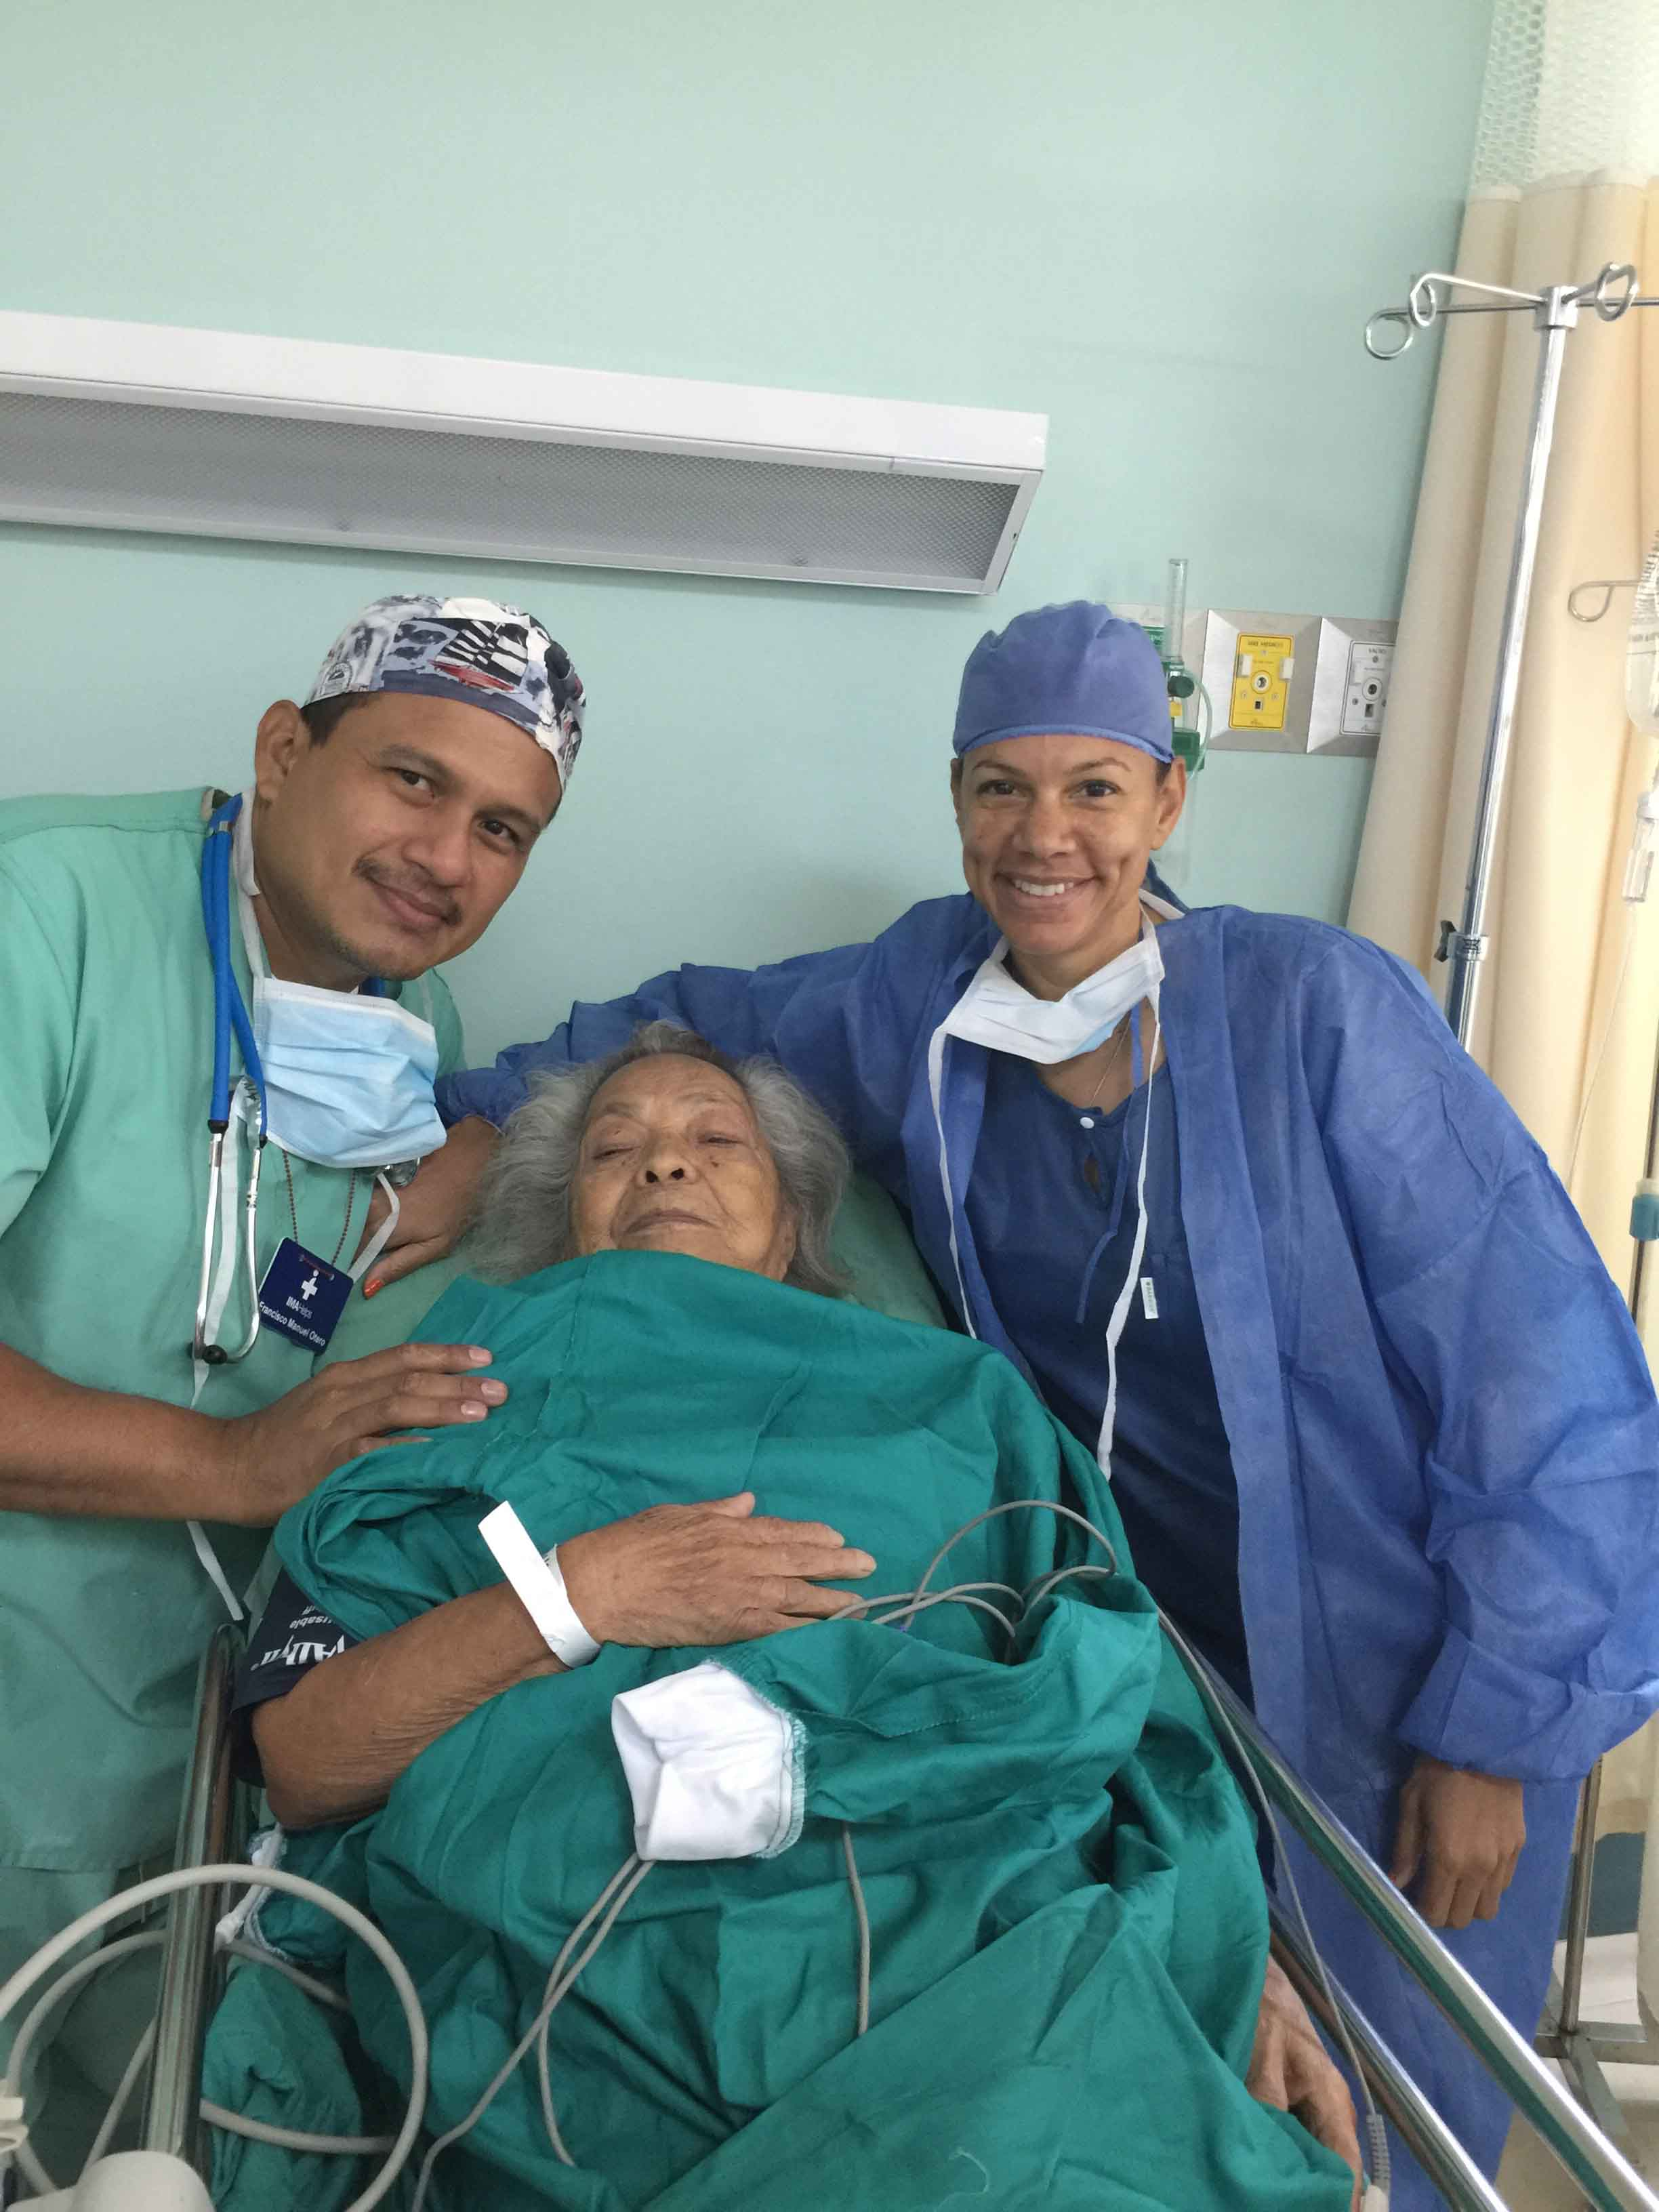 Dr Emilia Dauway - Giving